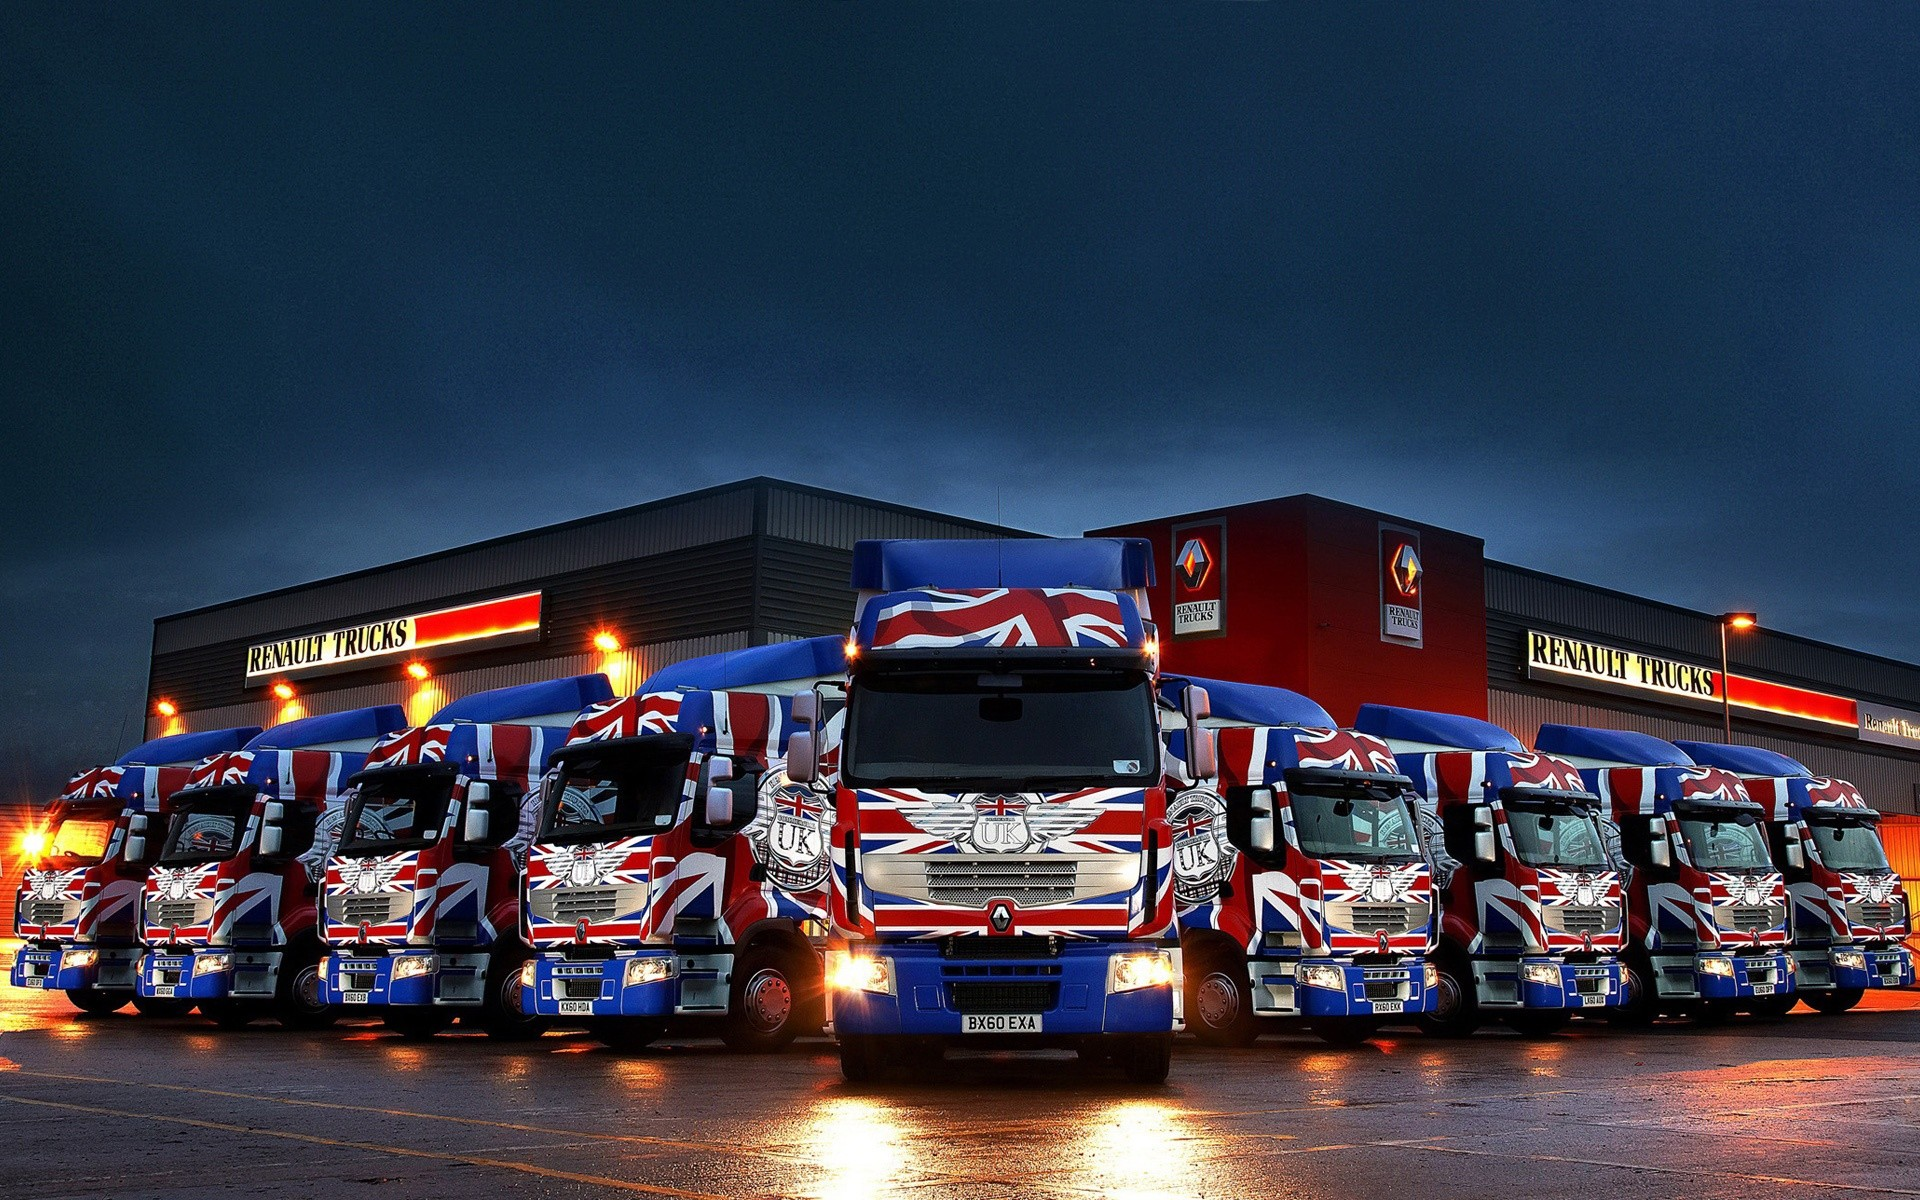 Girls And Trucks Wallpapers Renault trucks wallpapers